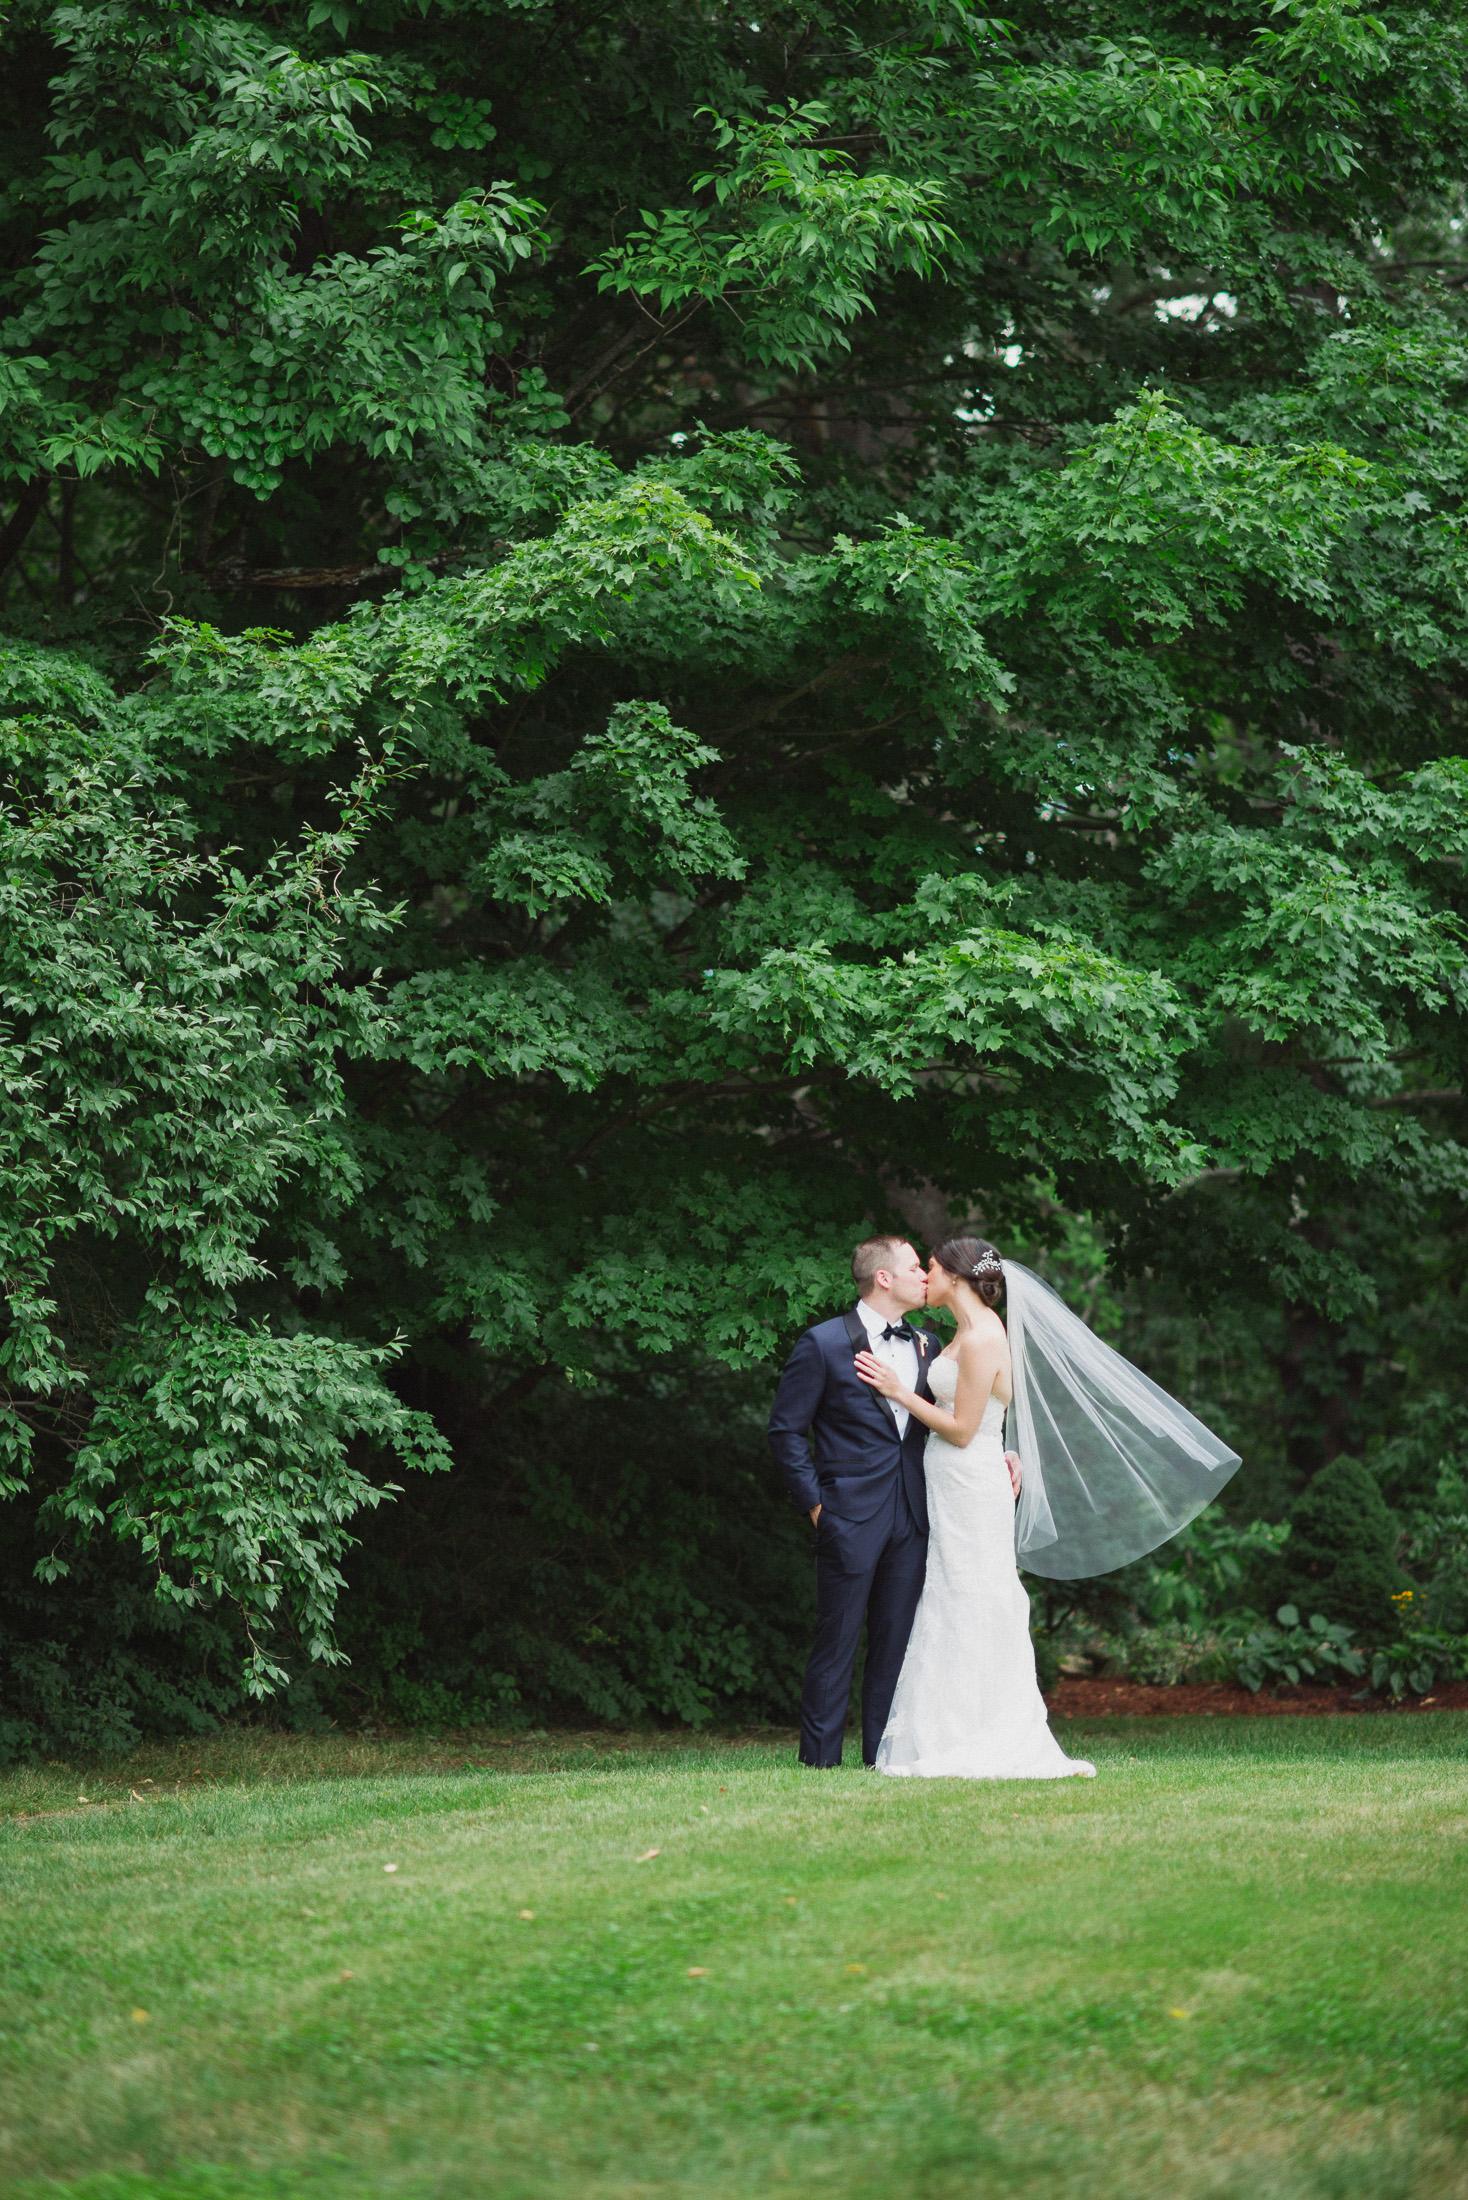 NH Wedding Photographer: couple near trees at BVI